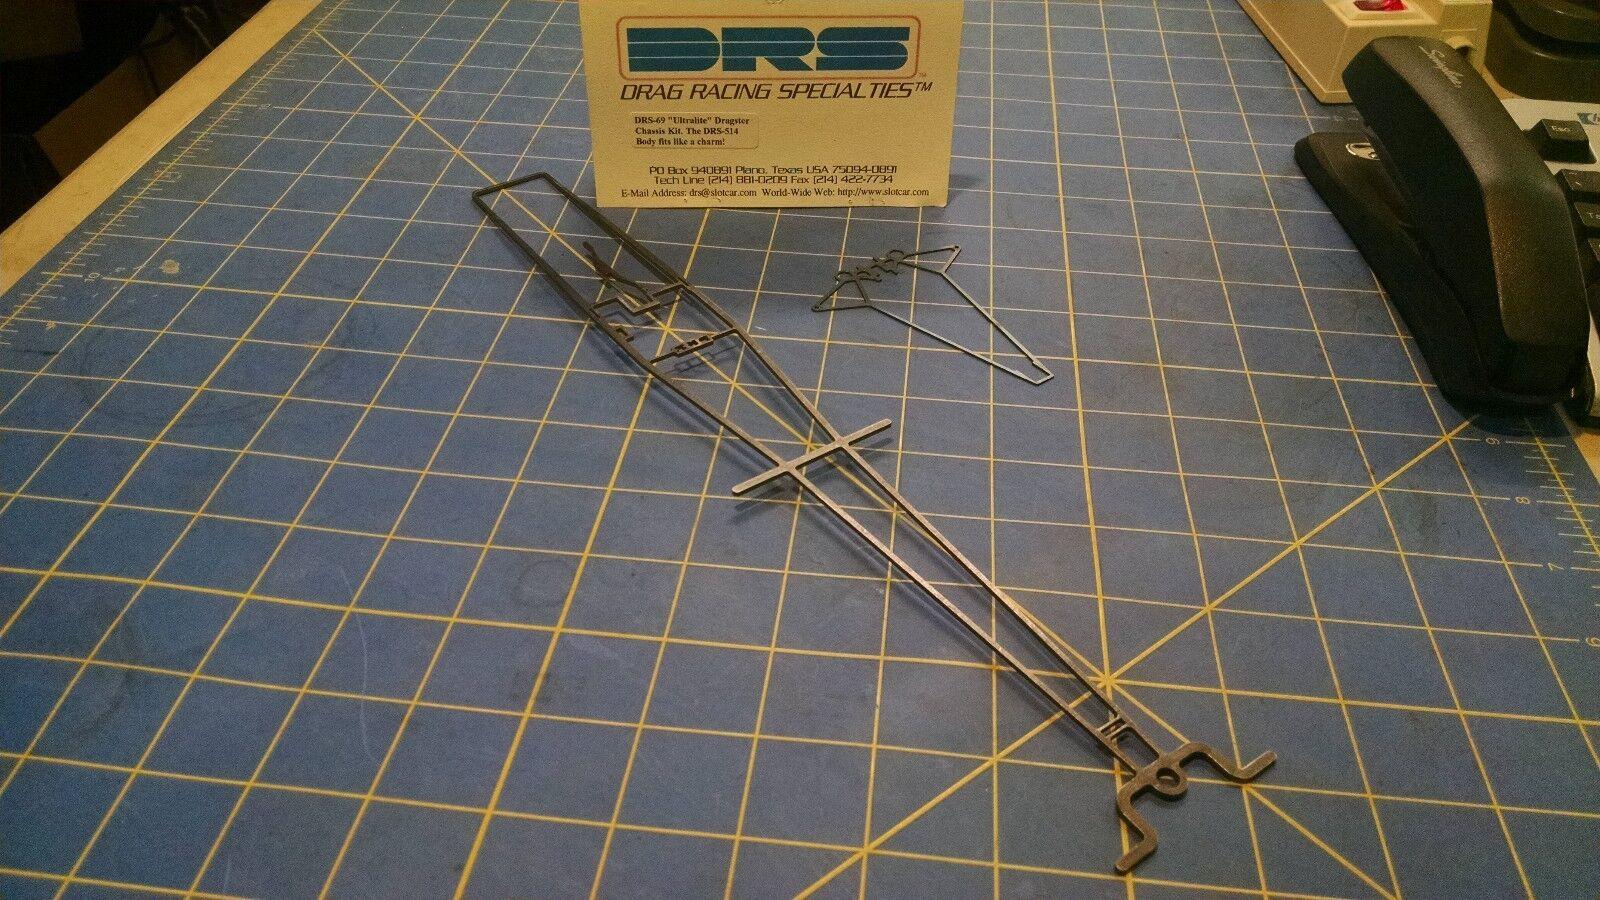 Drs 69 ultralite dragster - kit von mid america naperville